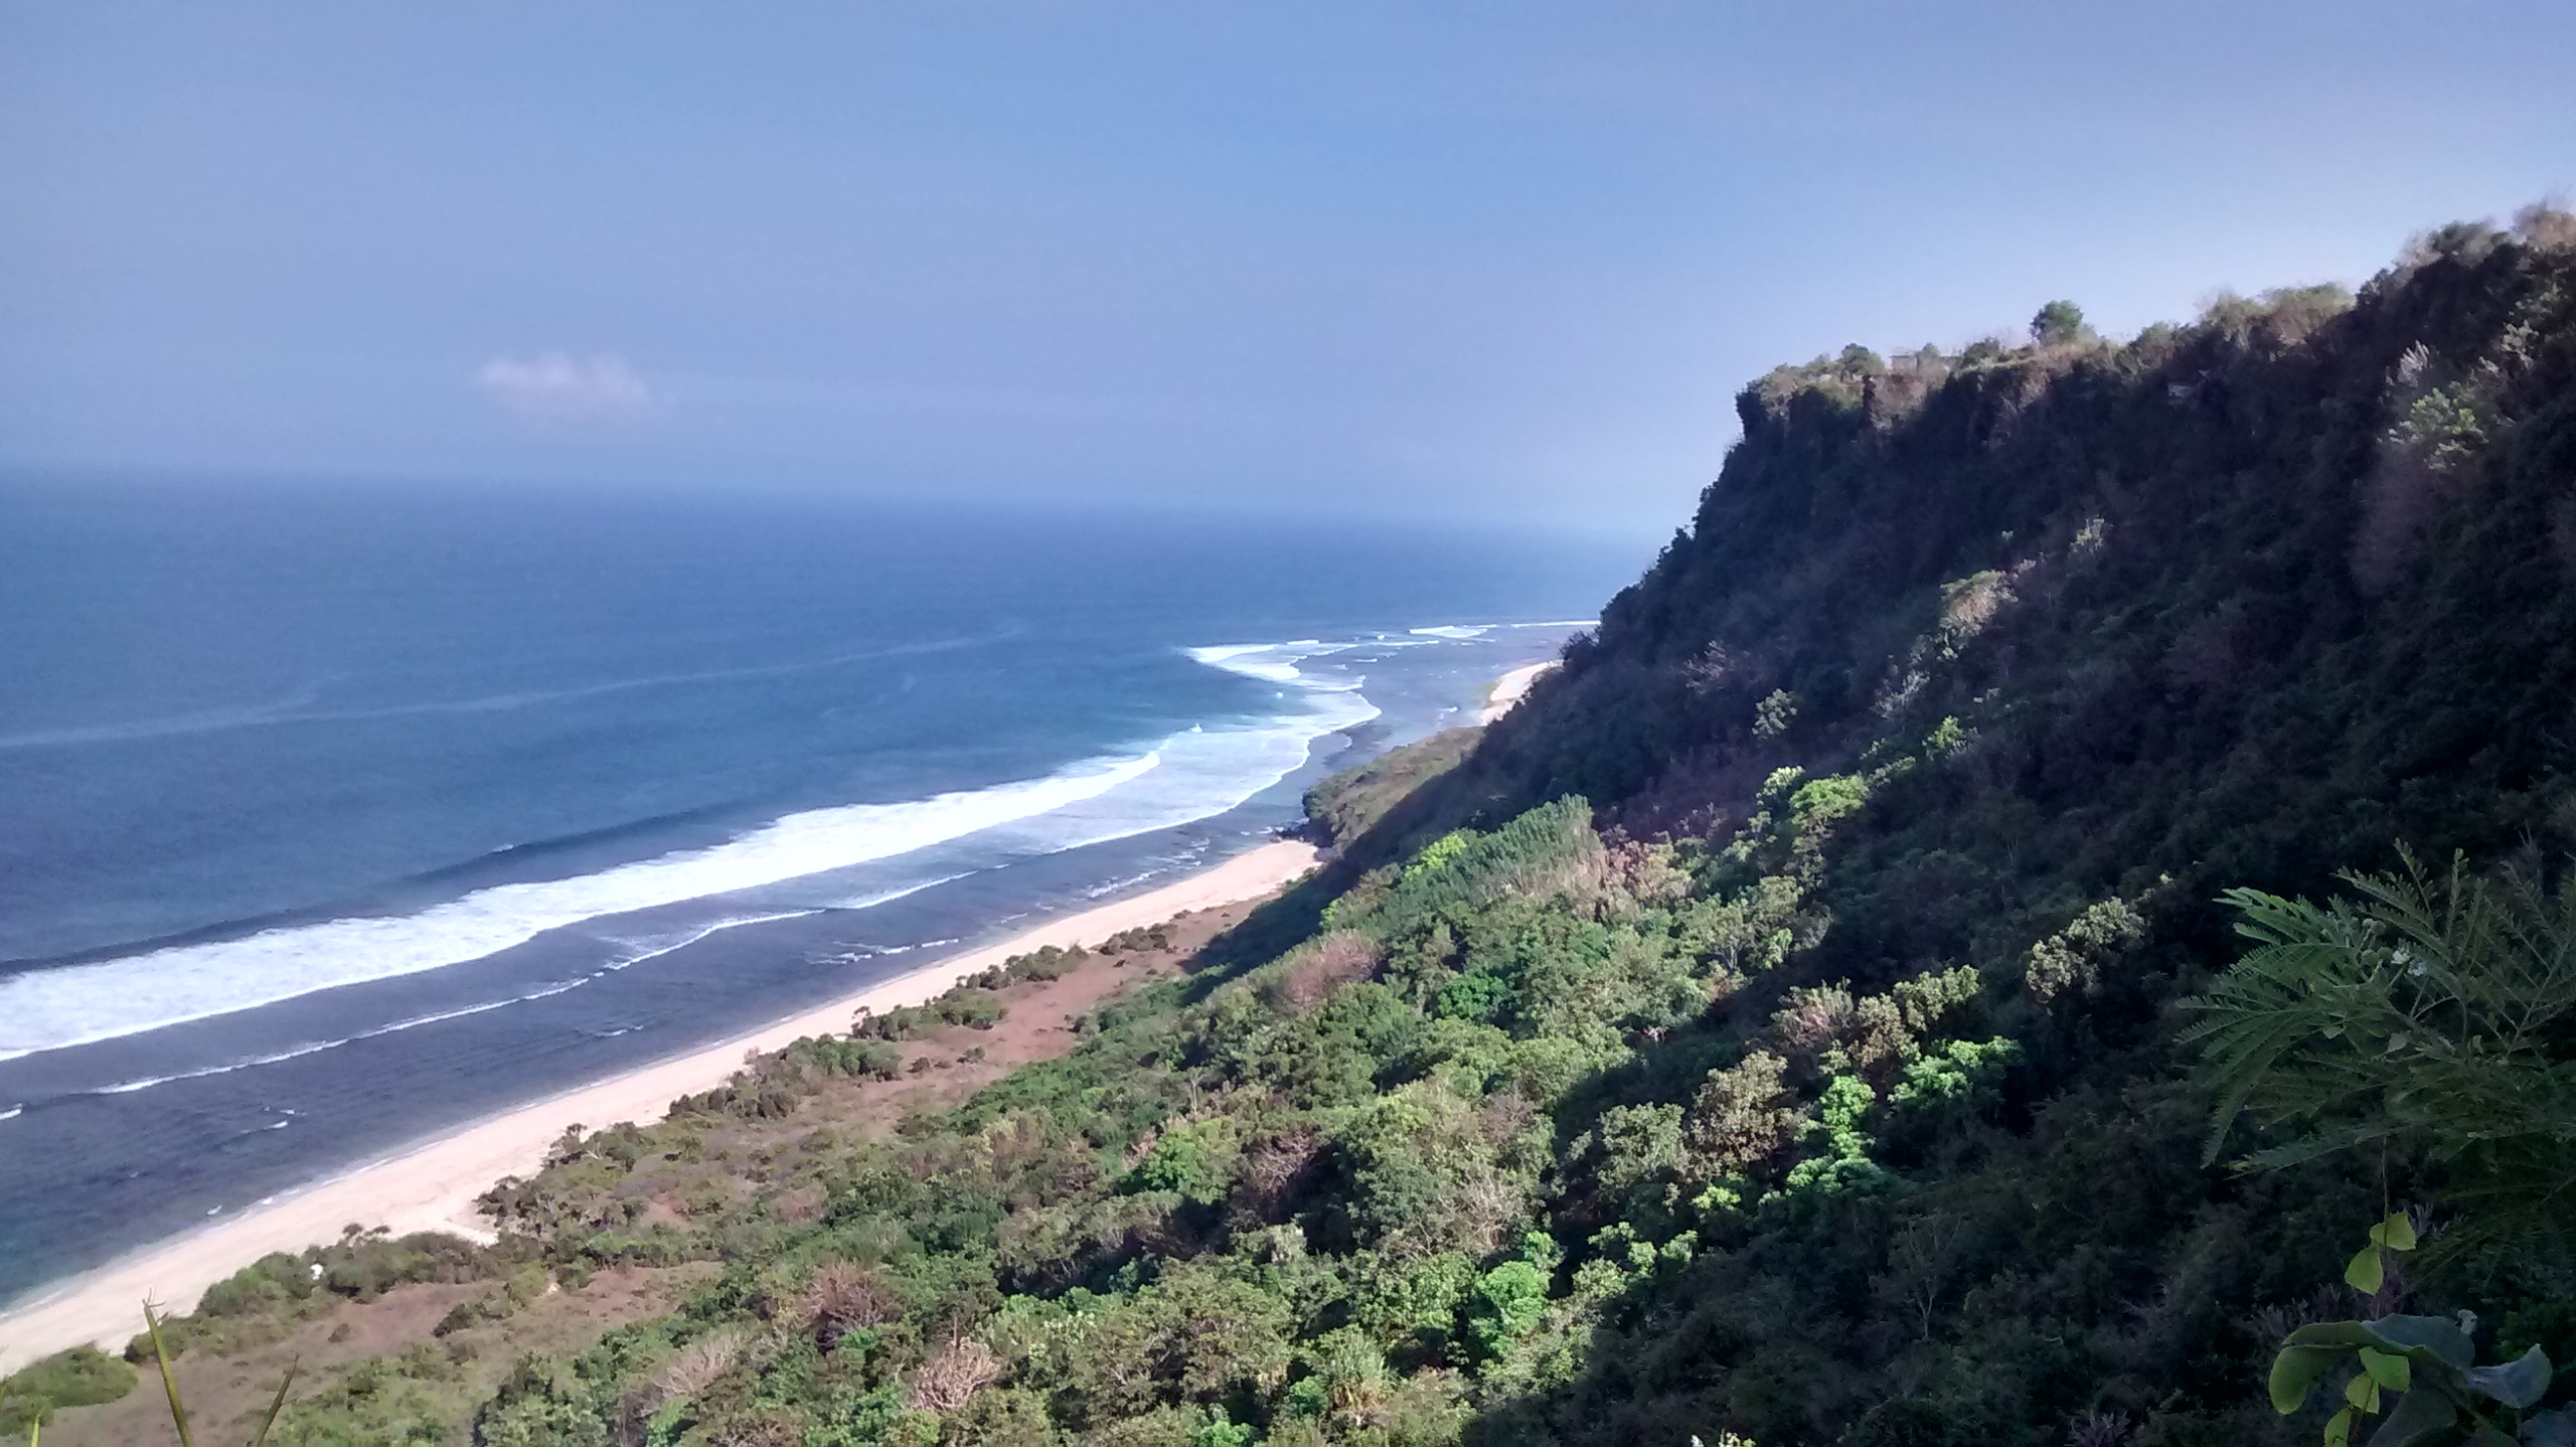 Nyang Nyang Bali, spiagge più belle del mondo